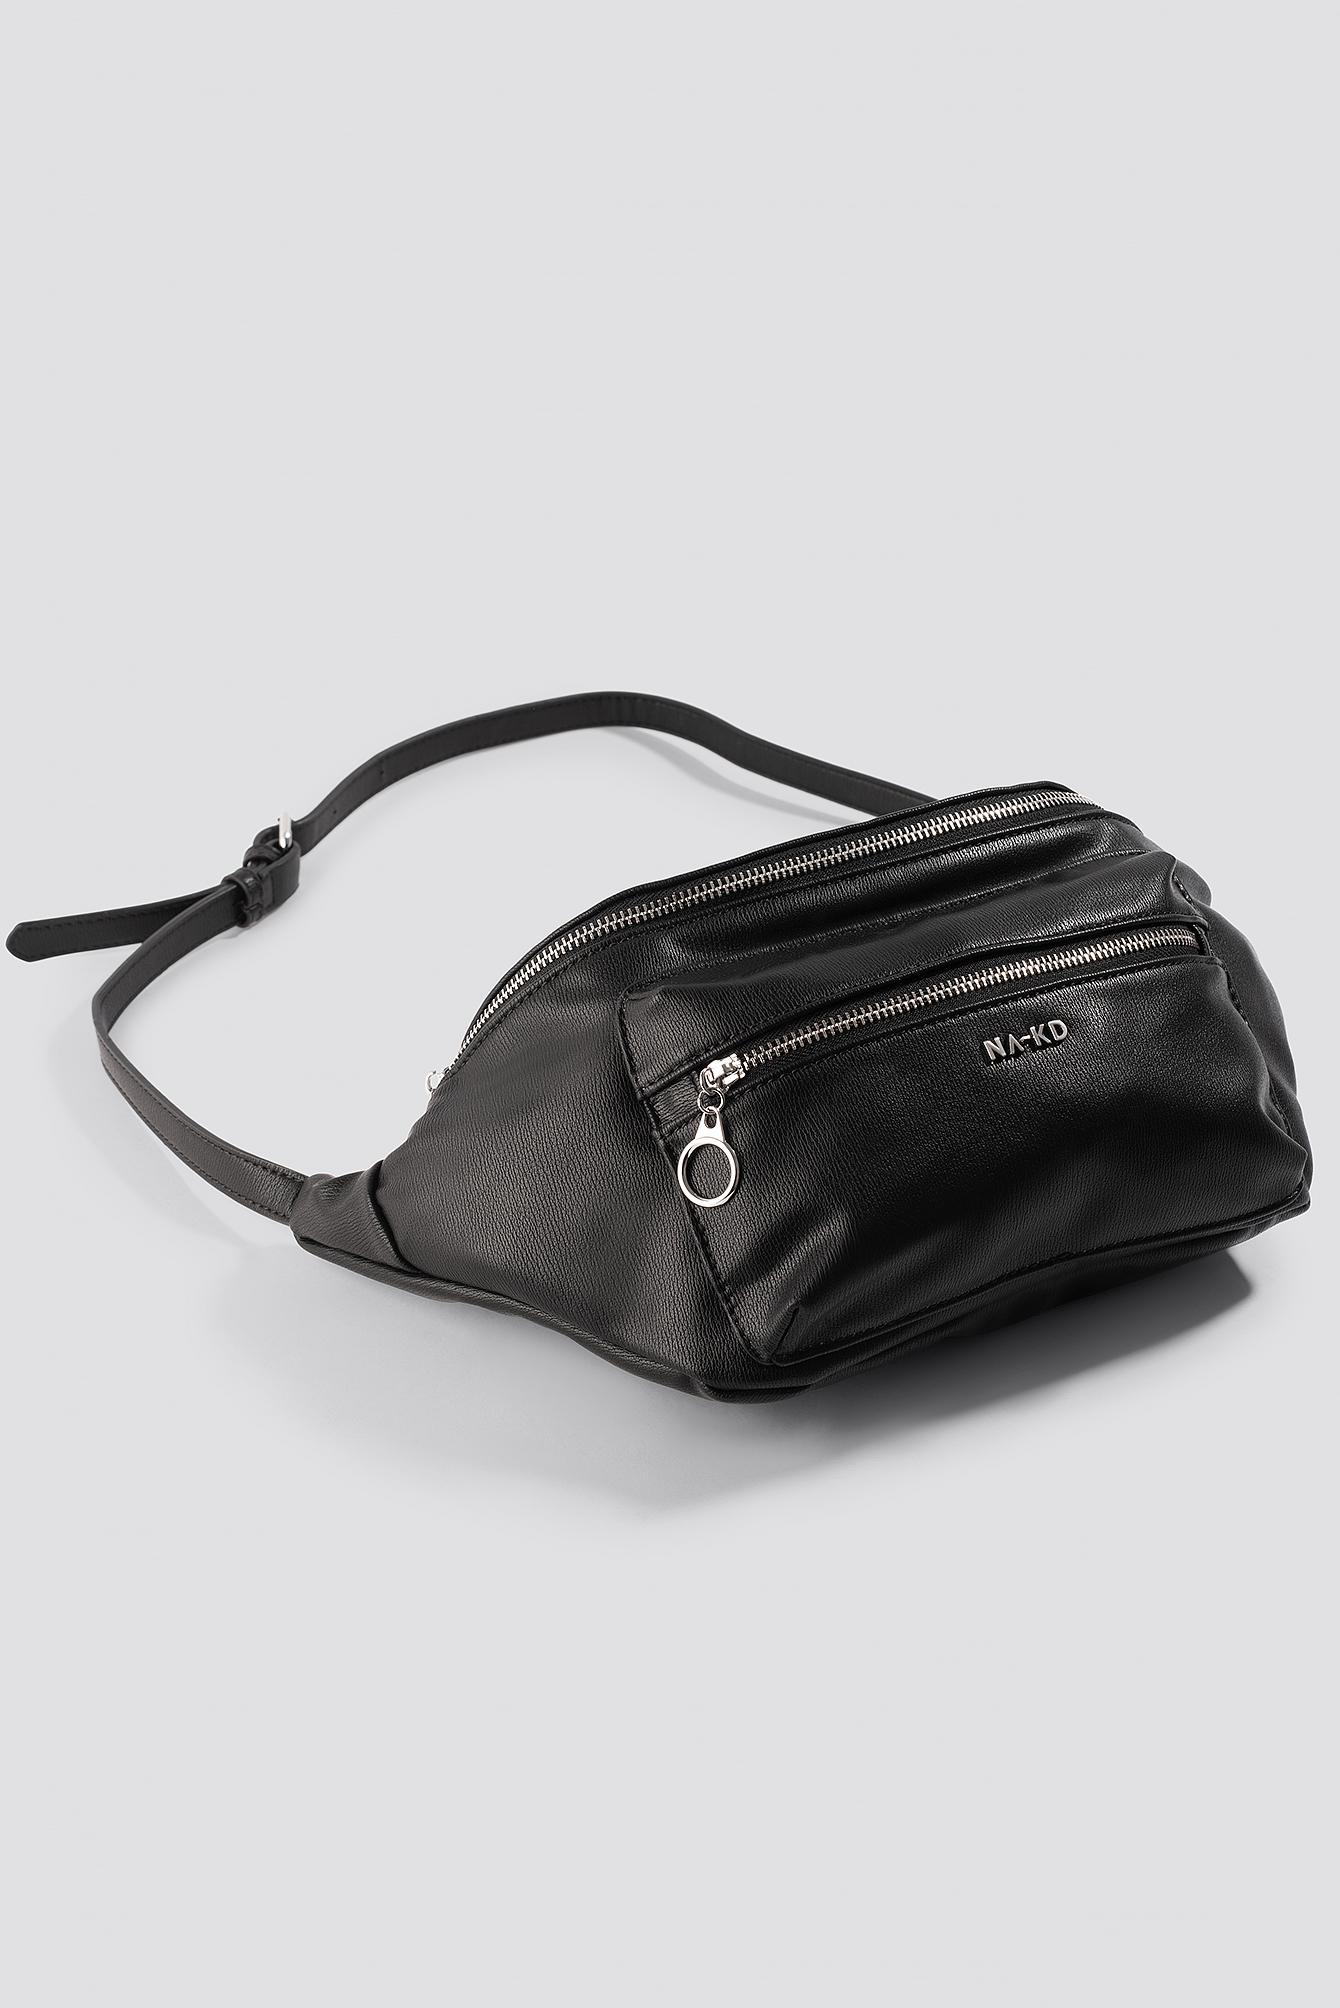 na-kd accessories -  Big Zipper Fanny Pack - Black